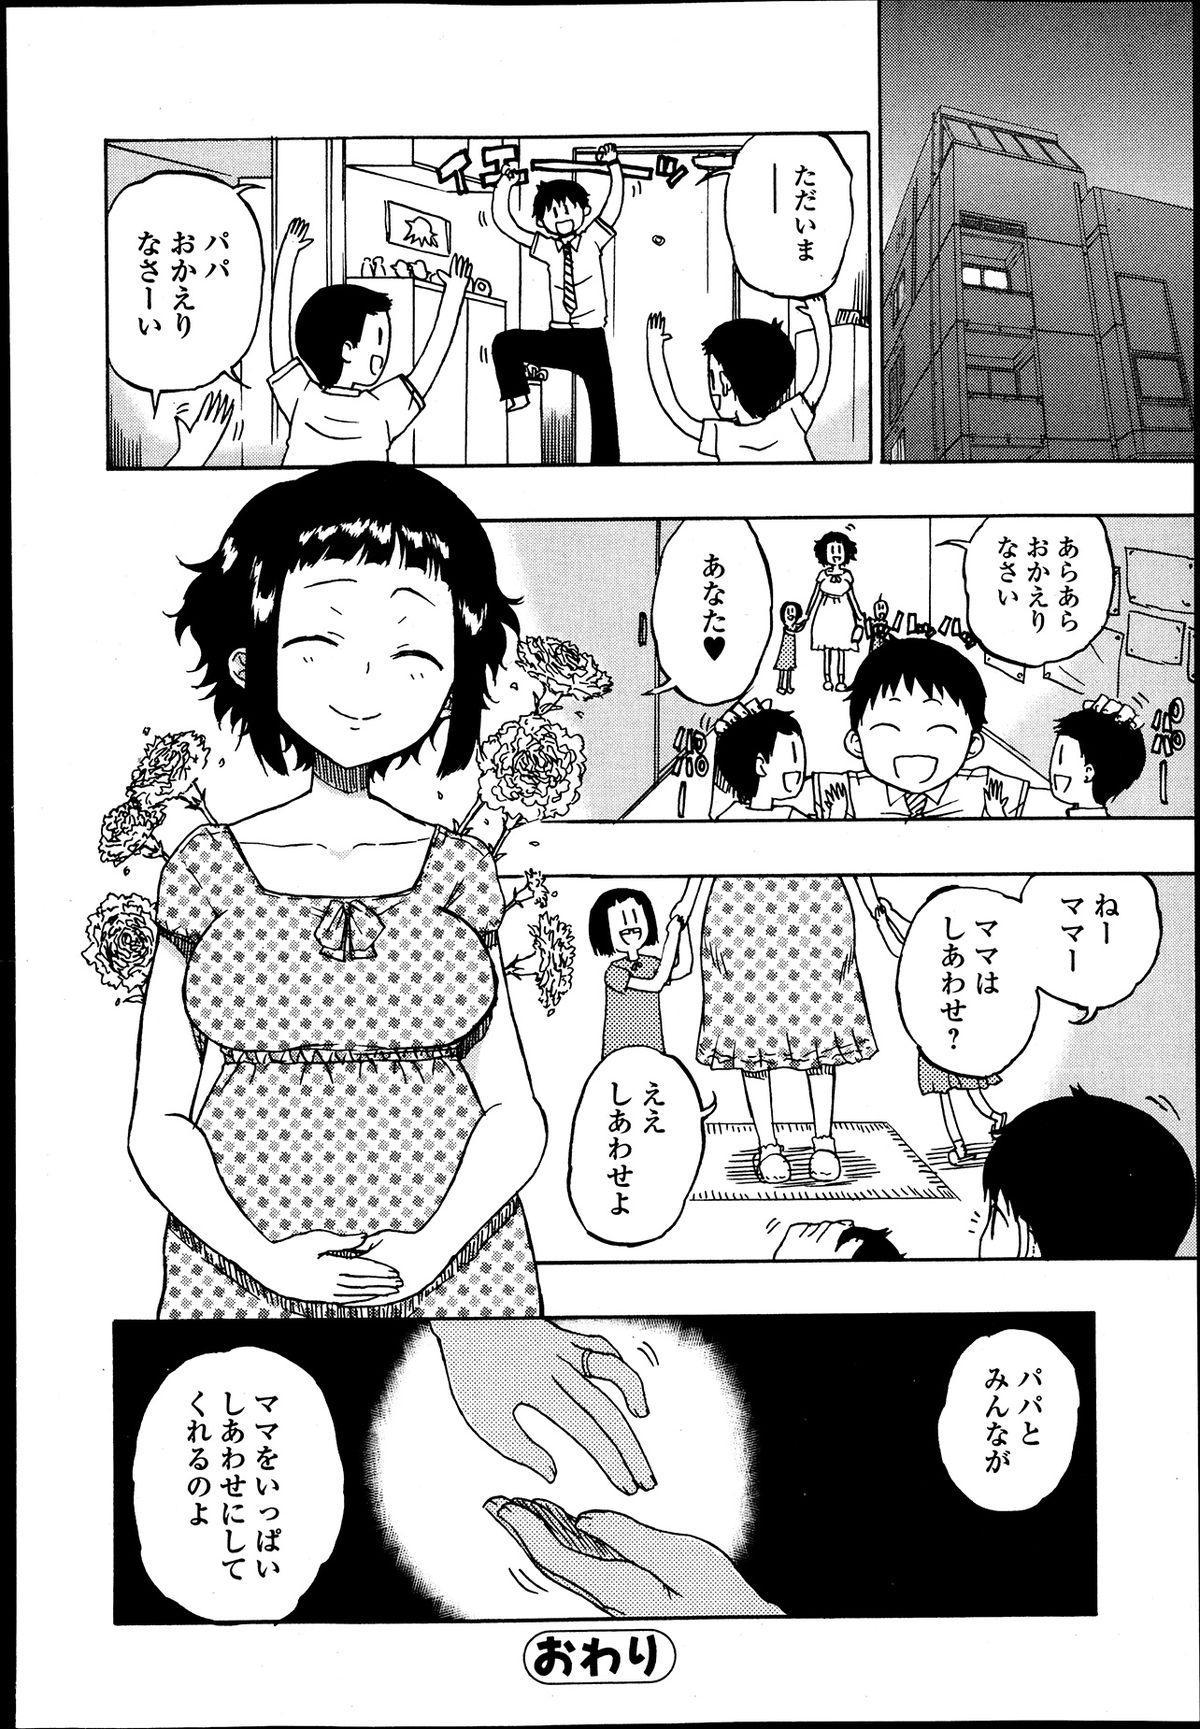 Bishoujo Kakumei KIWAME Road Vol.9 155